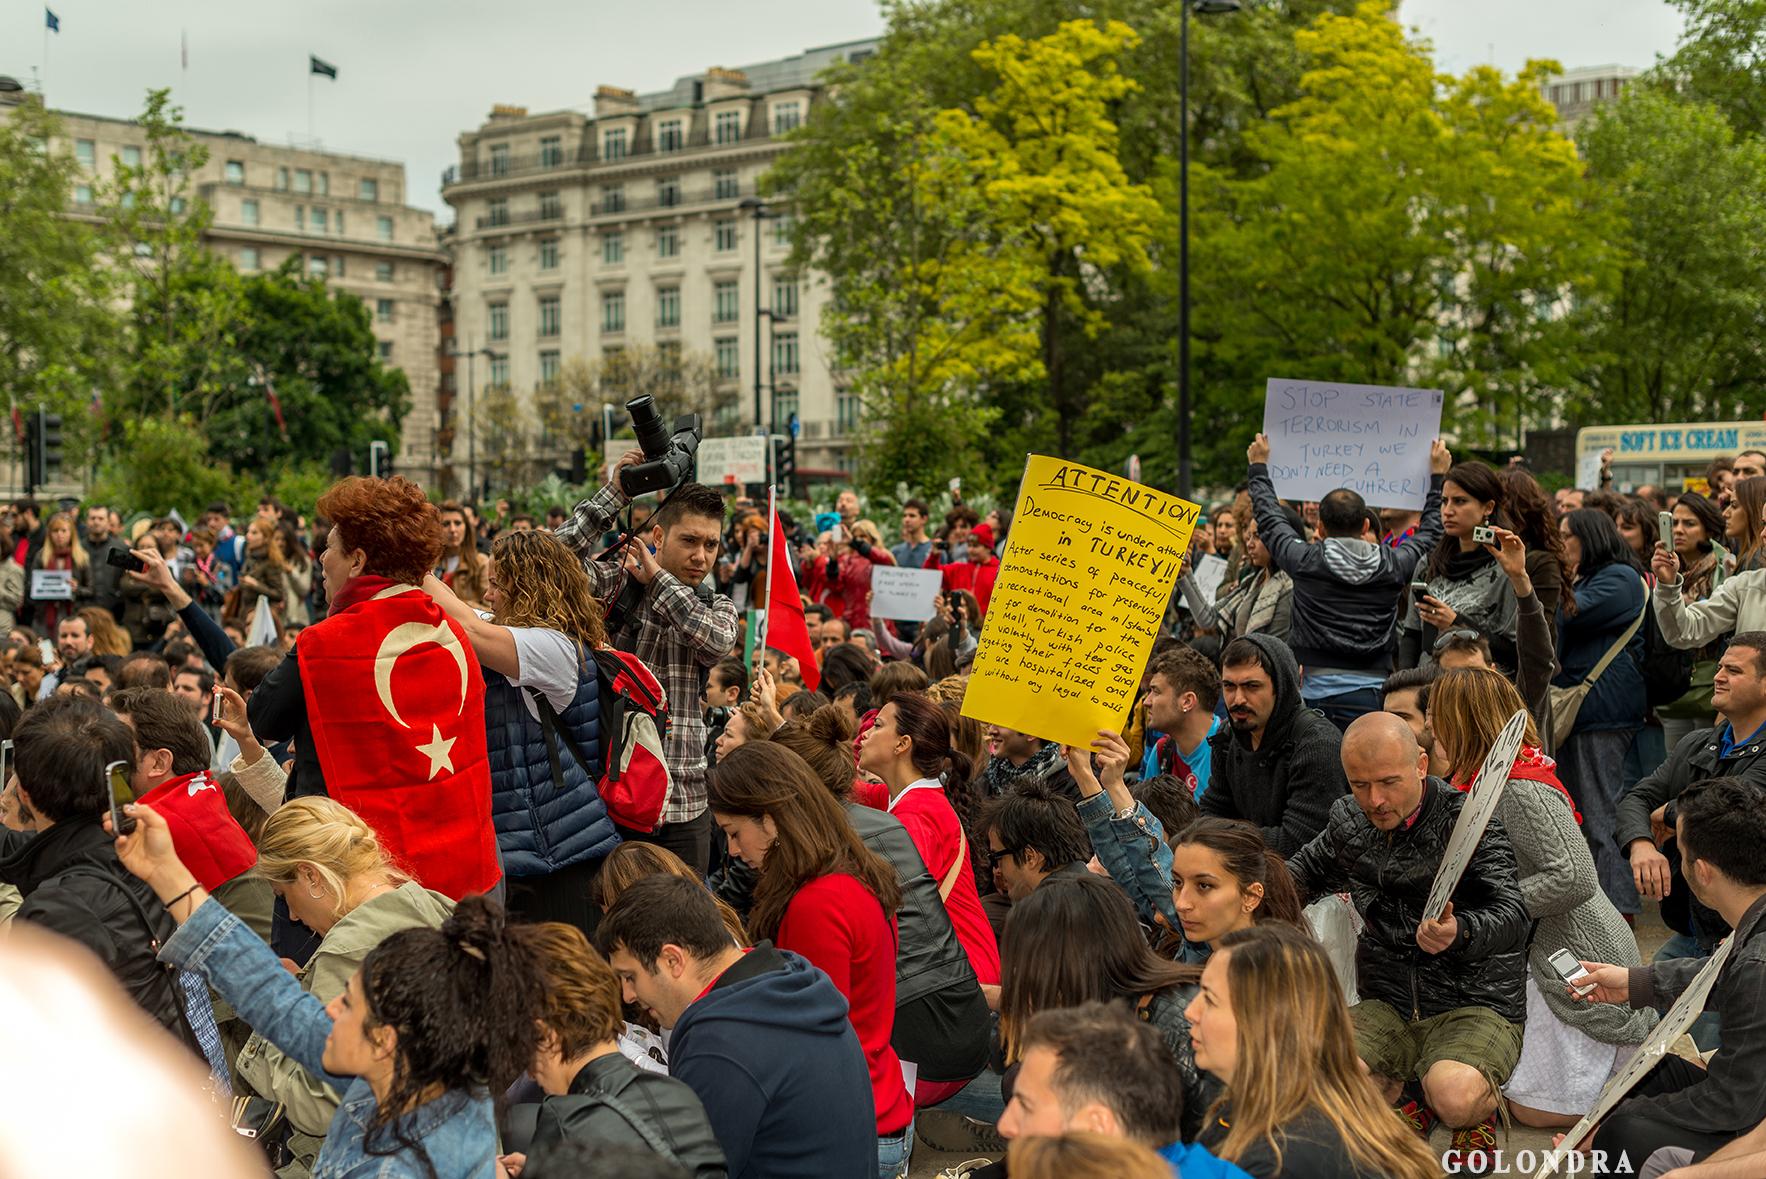 Londra'da Türklerin Protestosu – Hyde Park – Occupygezi